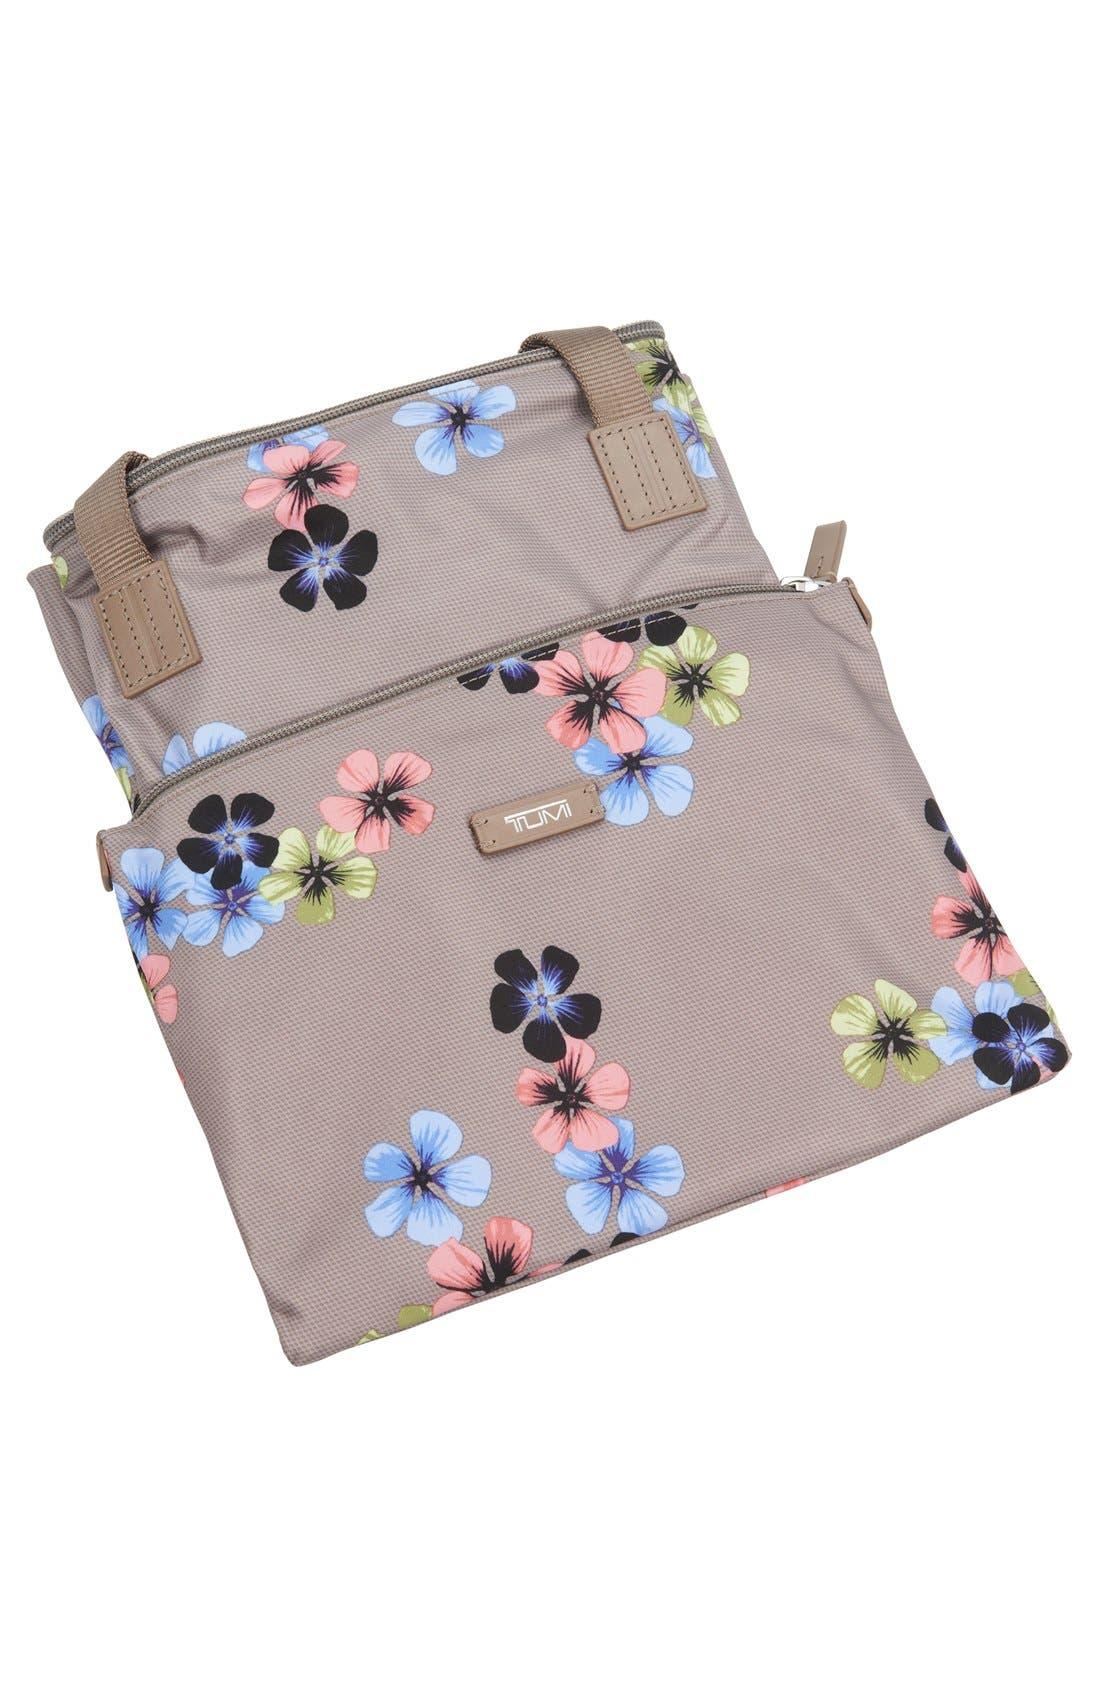 'Just In Case' Packable Duffel Bag,                             Alternate thumbnail 4, color,                             250